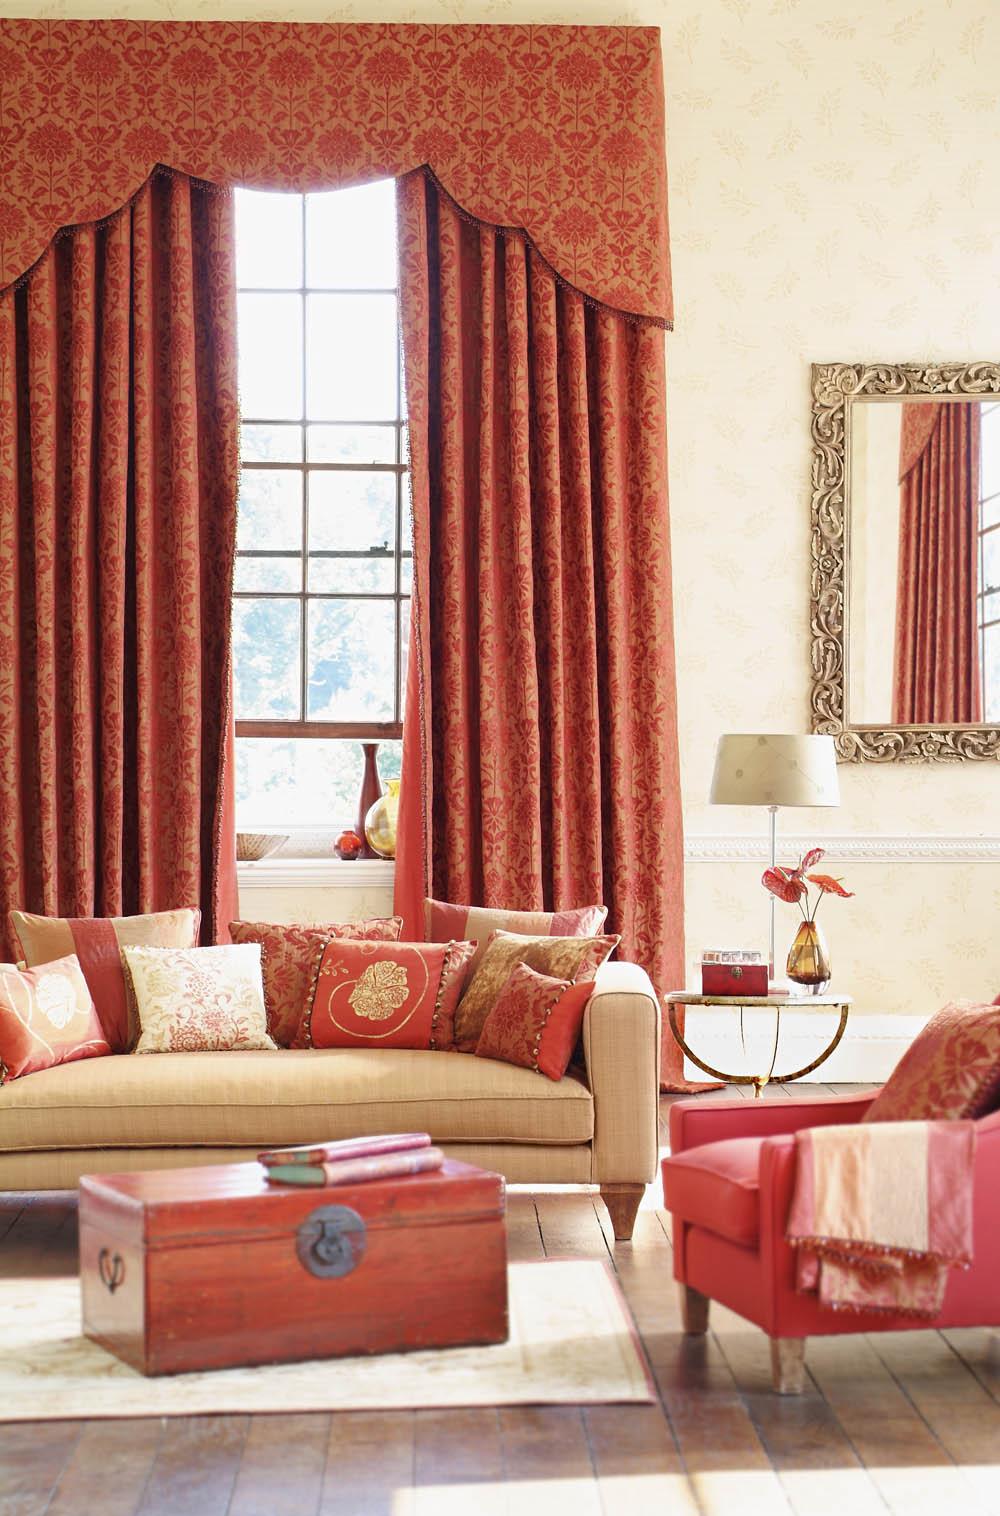 How to design bedroom interior